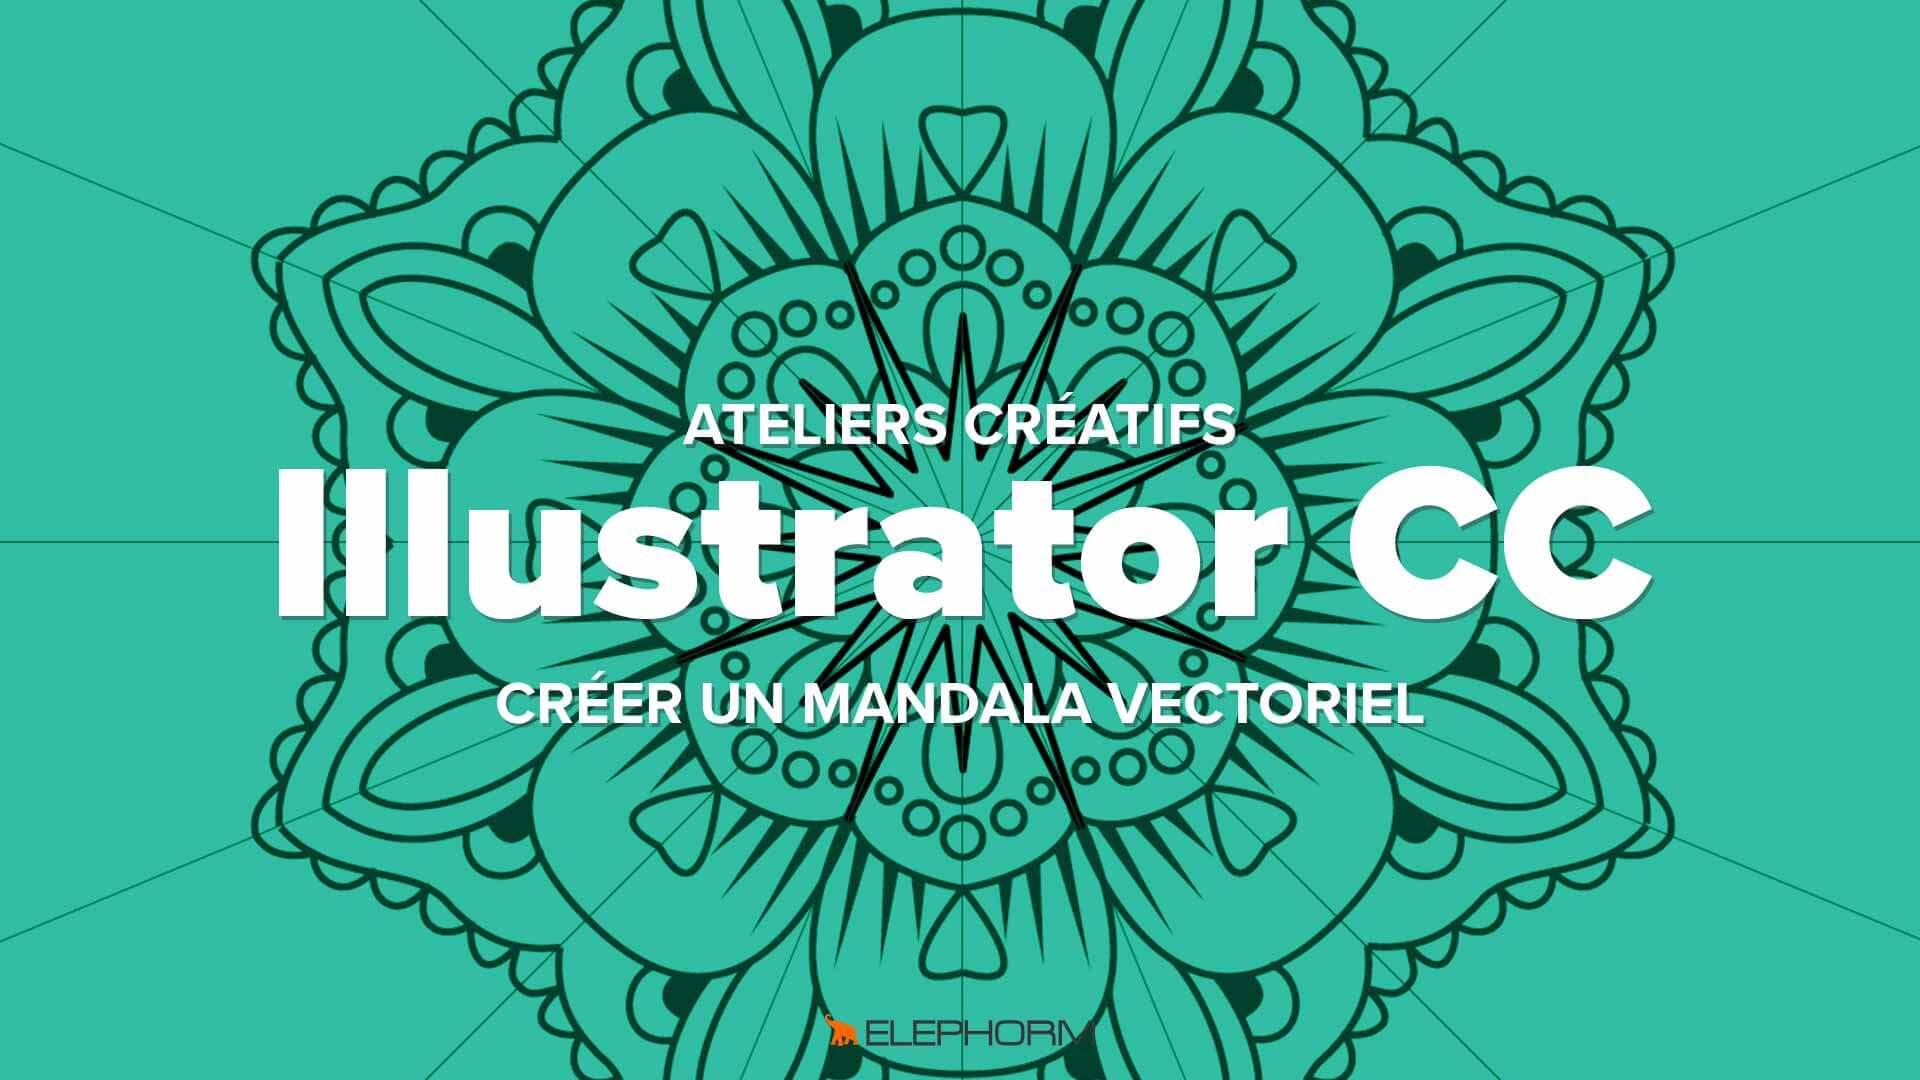 Dessiner mandala vectoriel Illustrator